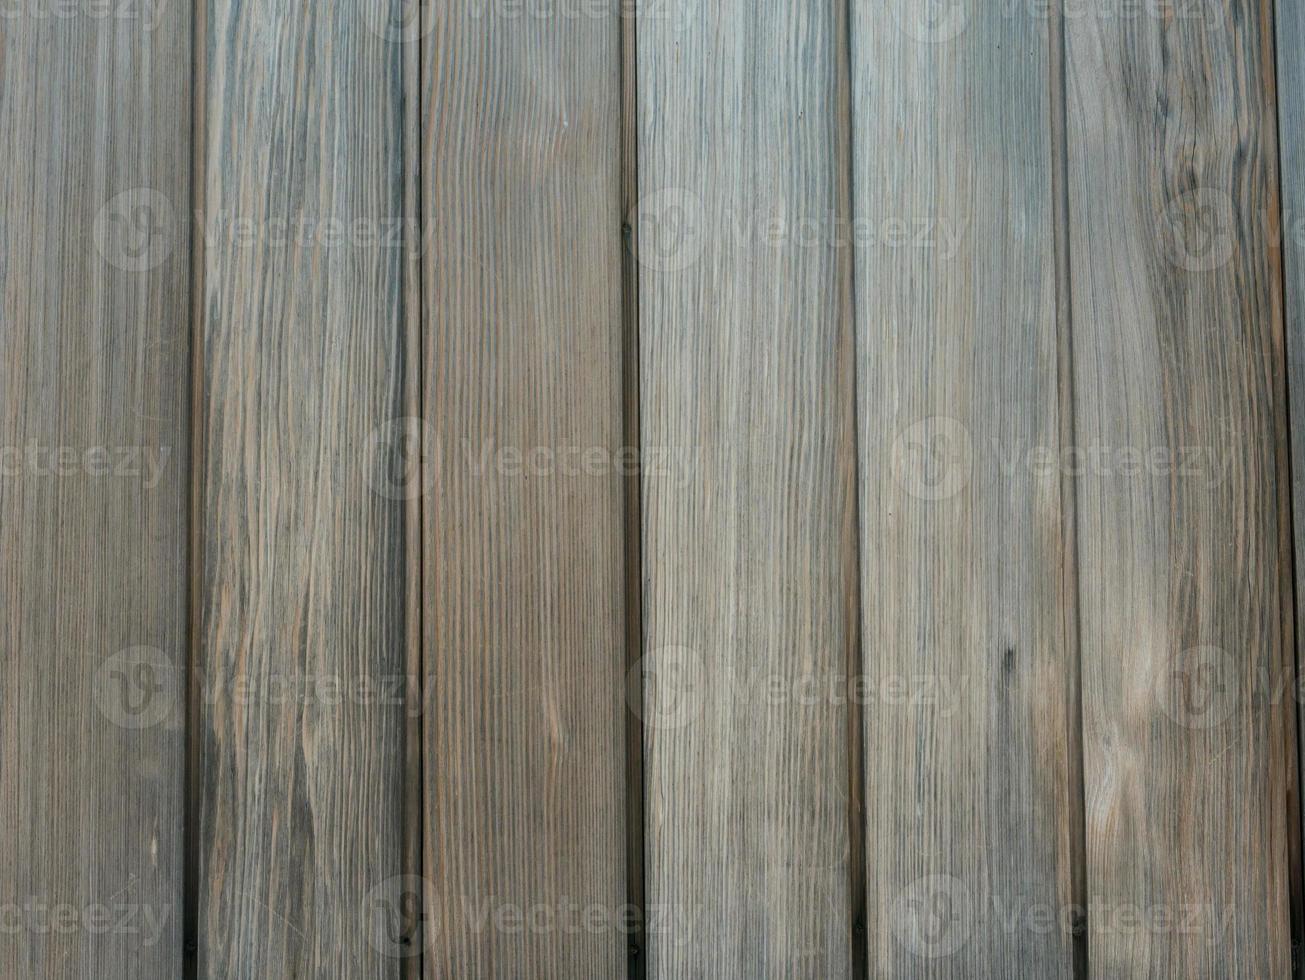 närbild av trä textur foto